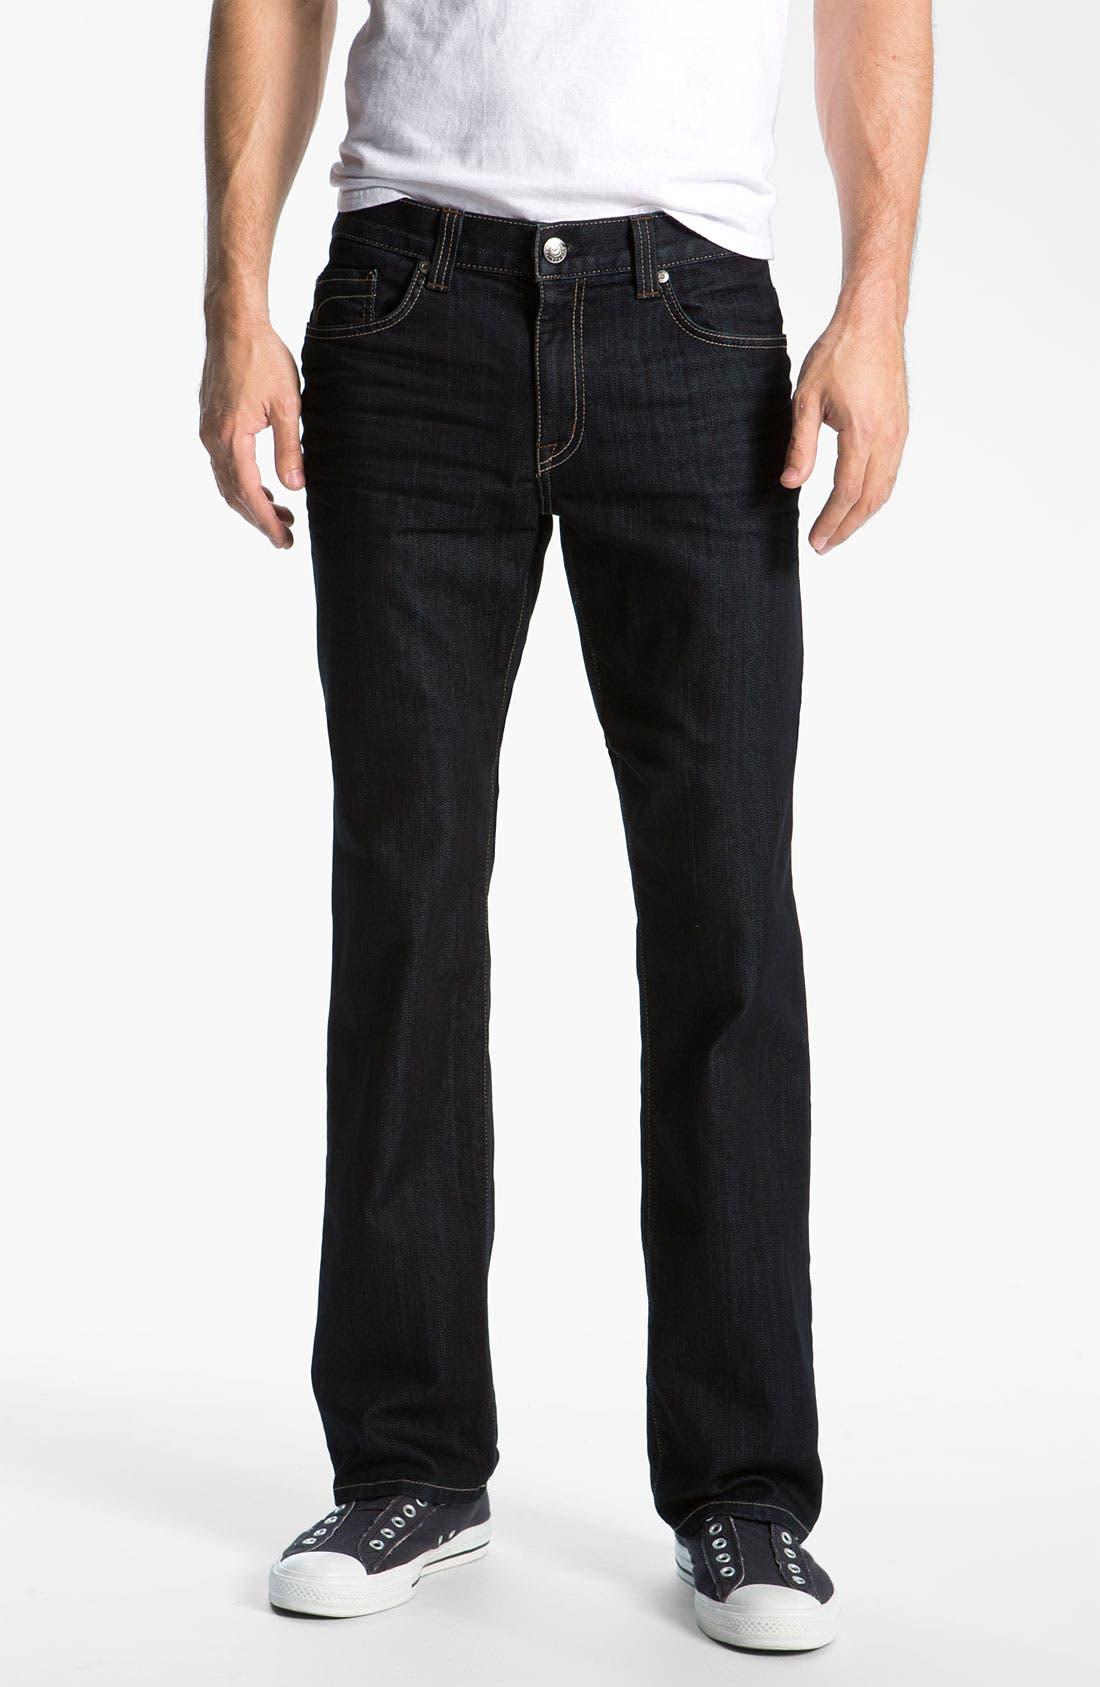 '50-11' Straight Leg Jeans,                         Main,                         color, Sabbath Rinse